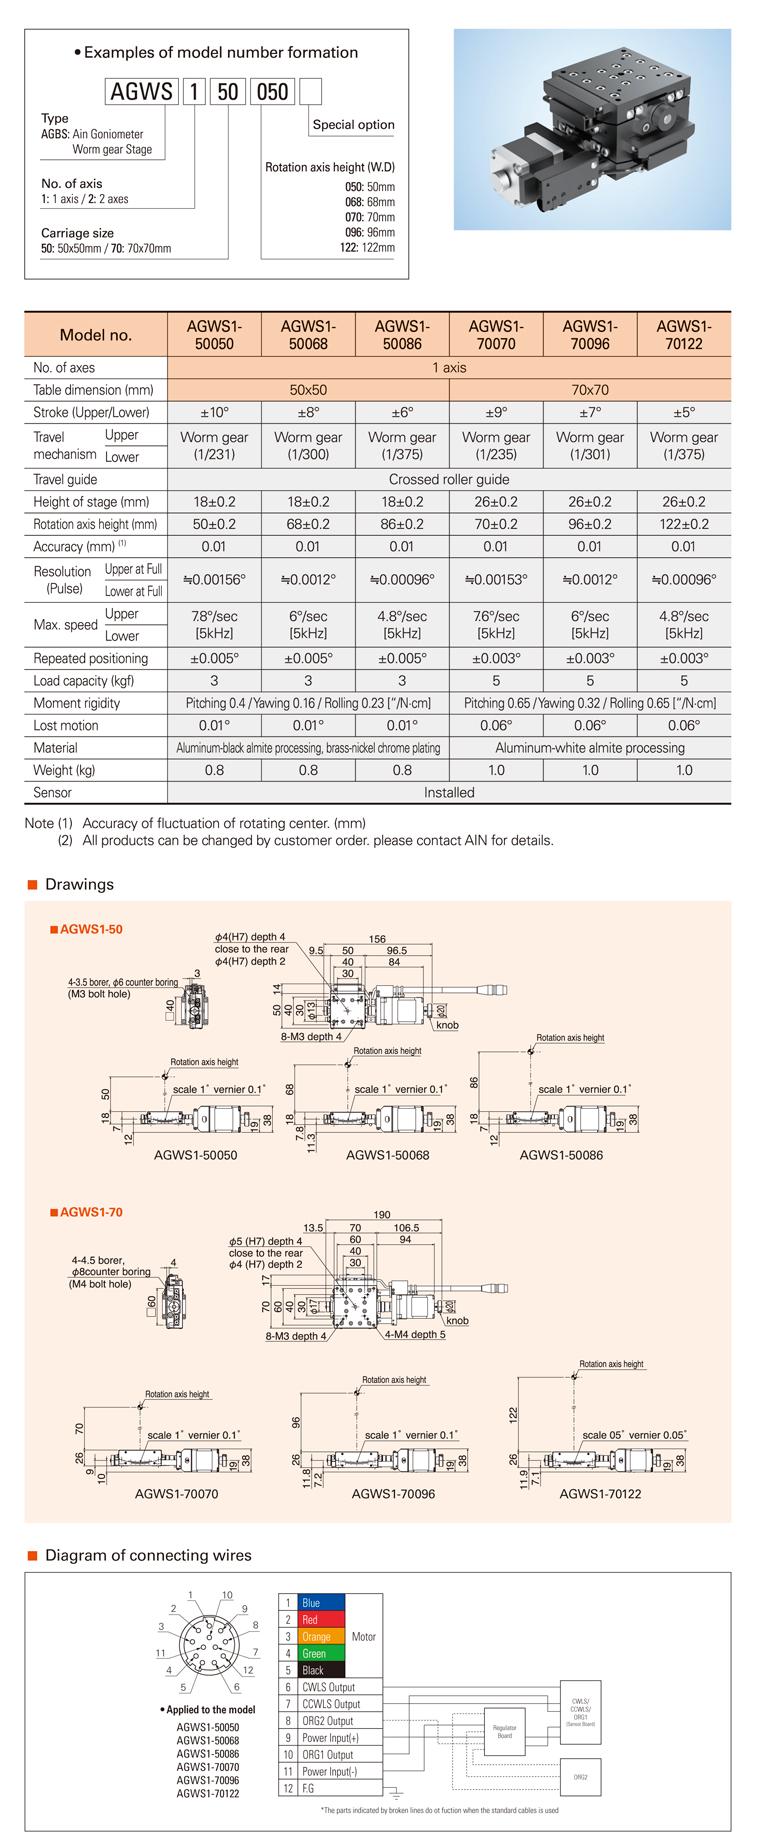 AIN Motorized Goniometer Worm Gear Stage AGWS1-50/70 Type